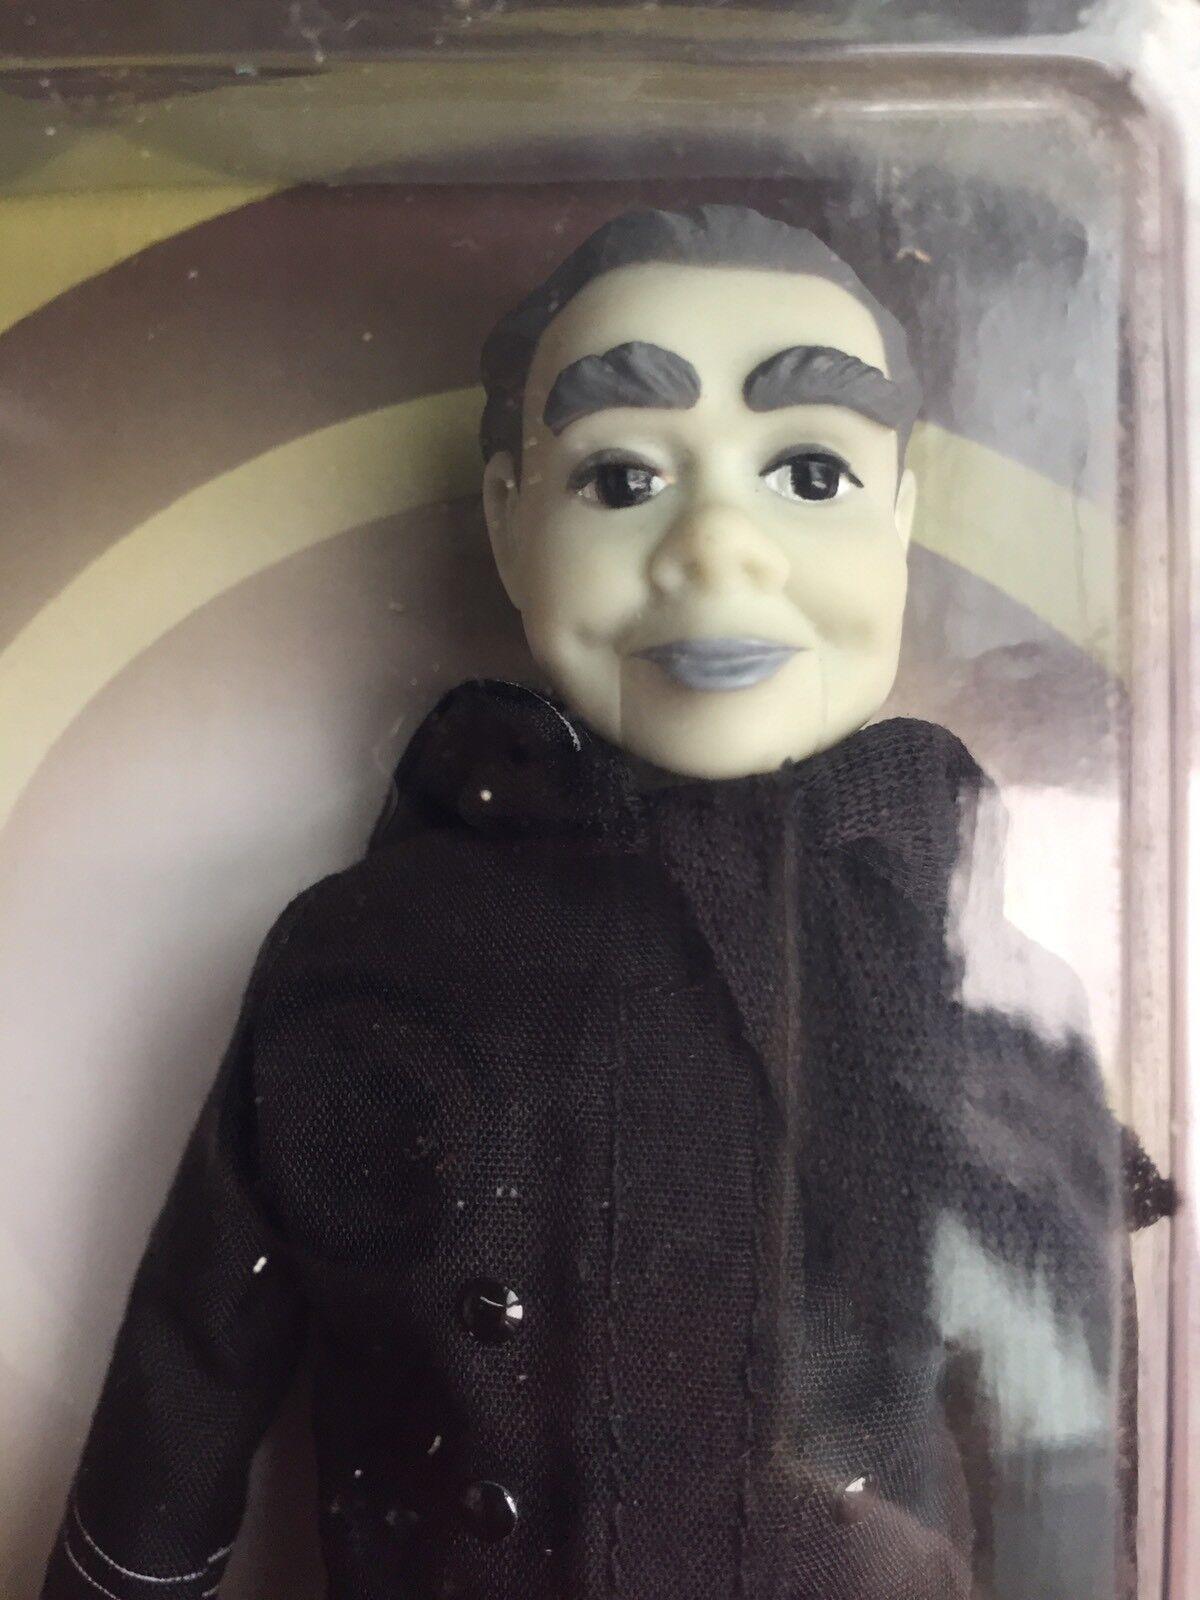 Twilight zone series 3 willie dummy sdcc ohne bif peng peng action - figur